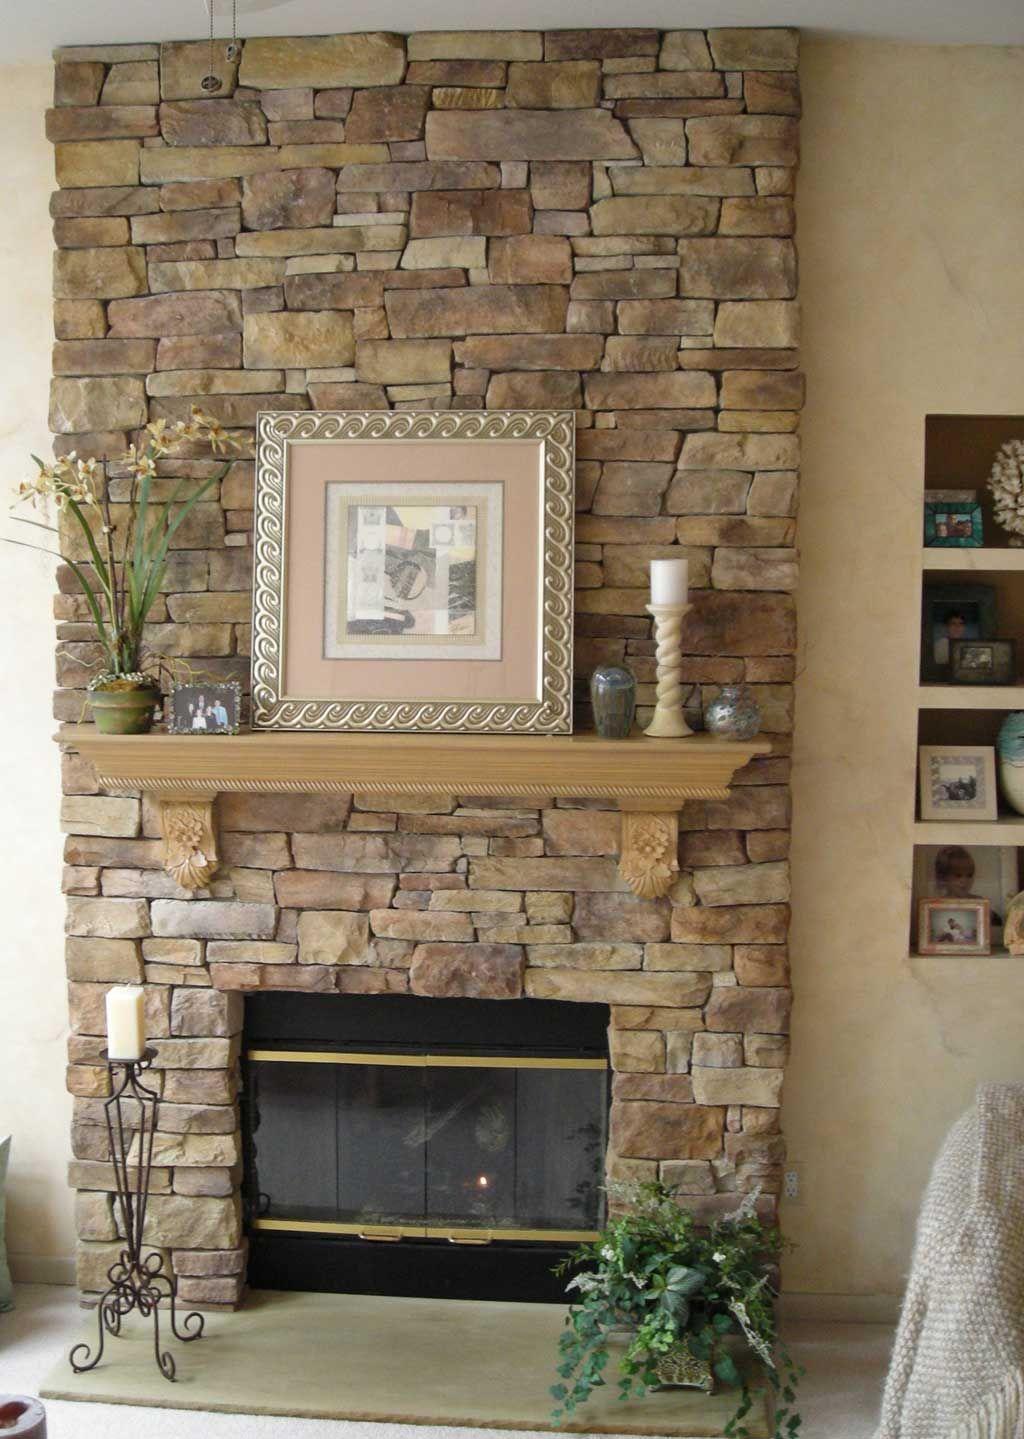 Flat Stone Fireplace New Stone Veneer Fireplace Design Fireplace In 2019